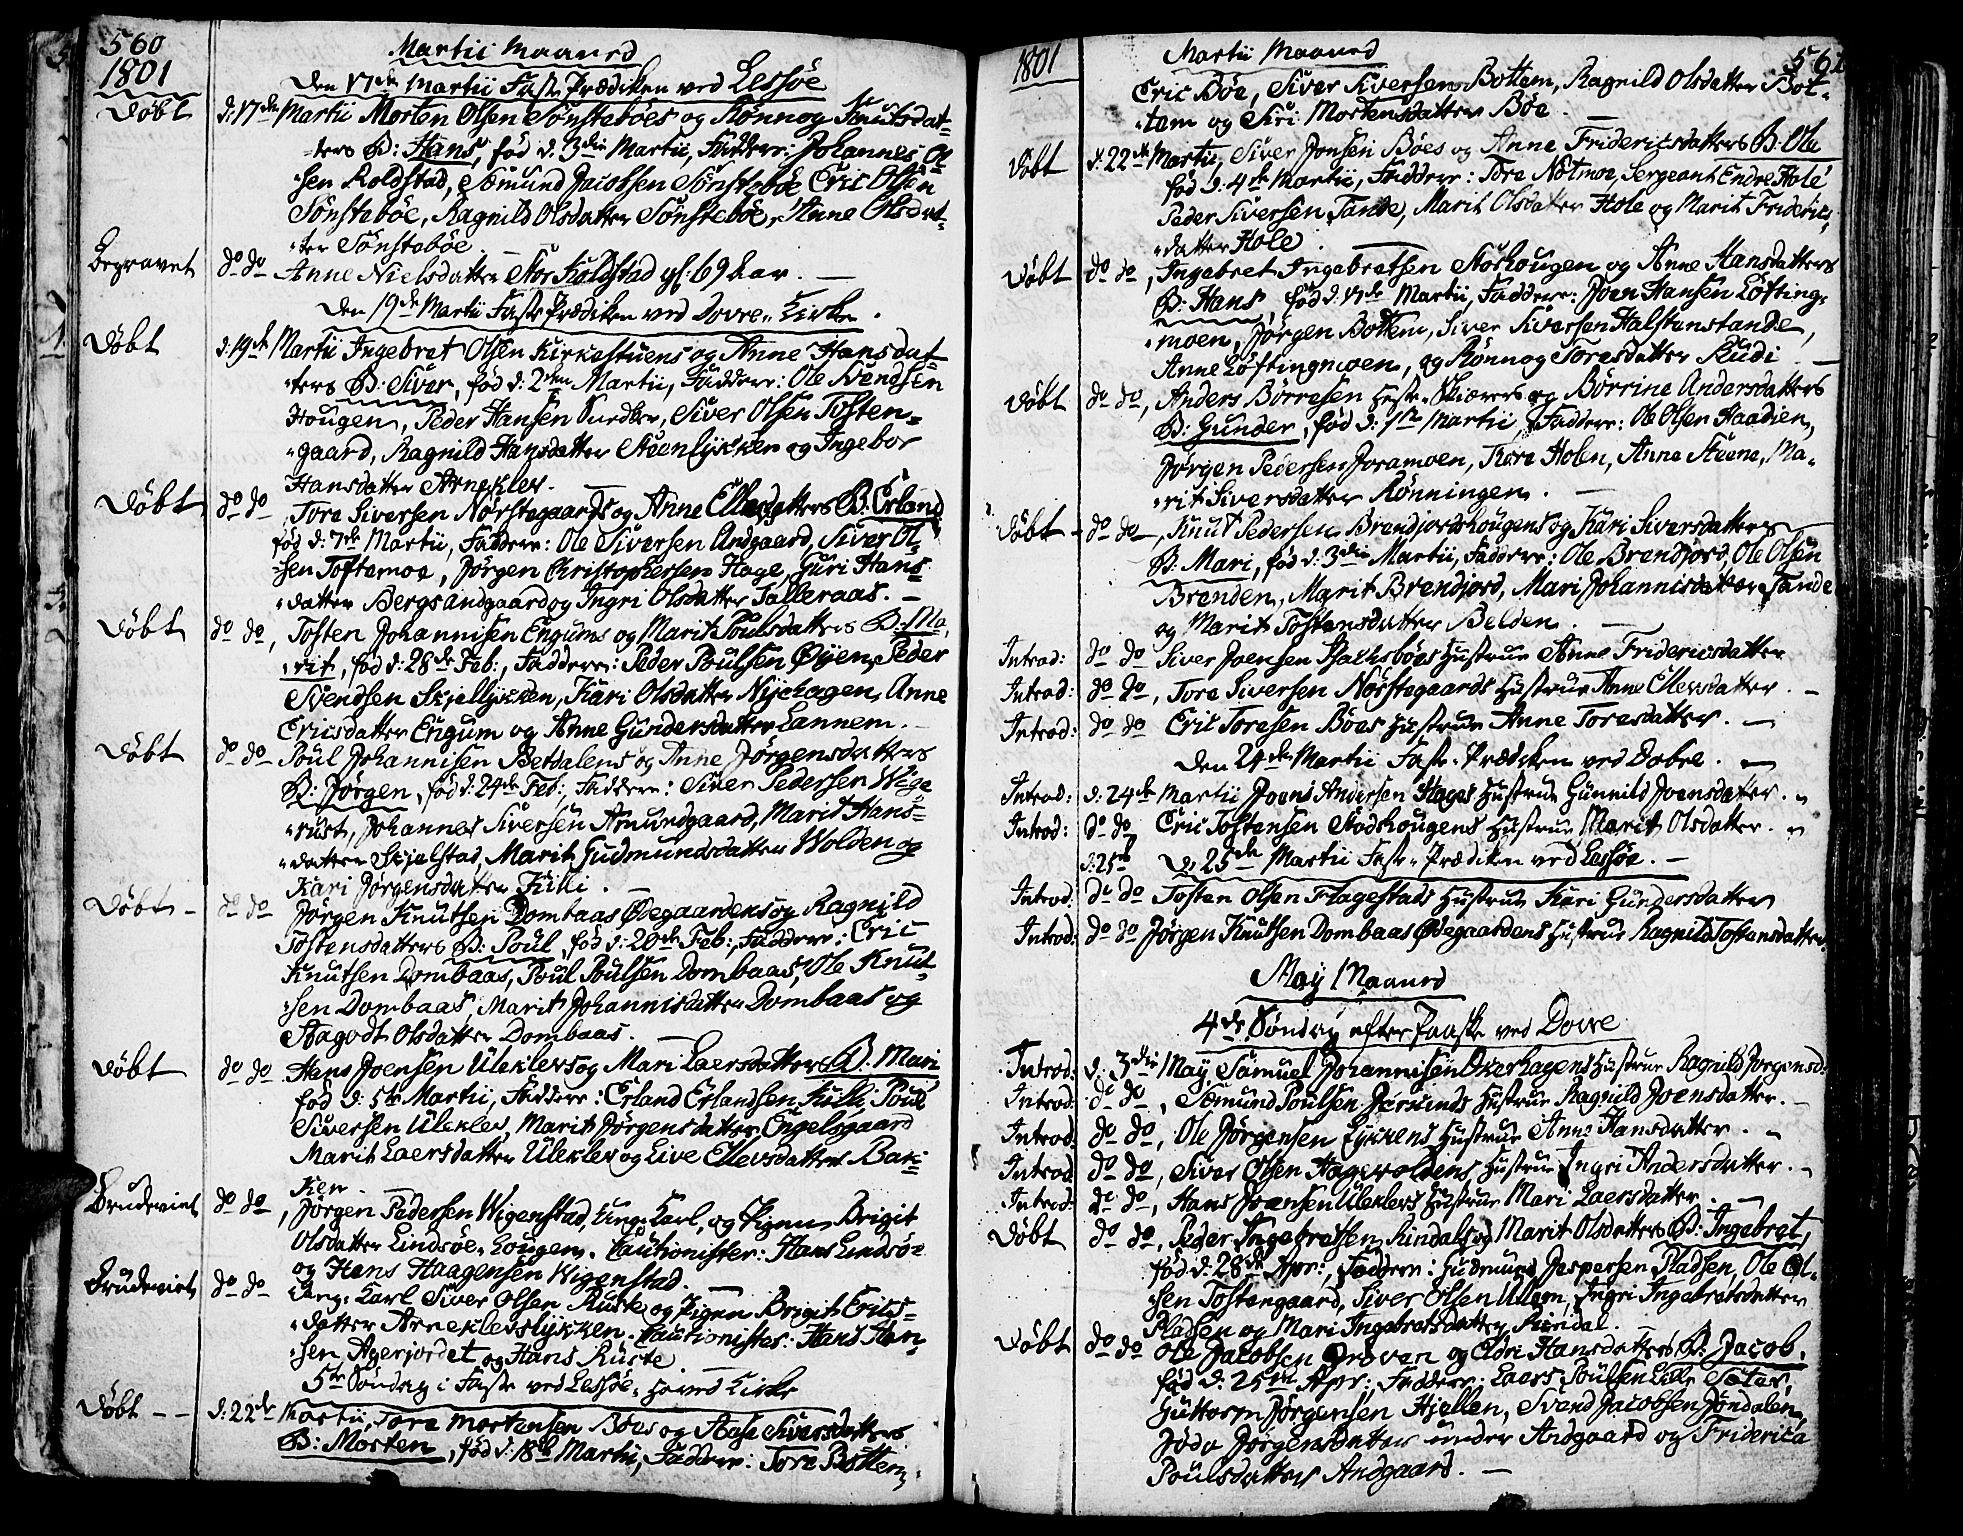 SAH, Lesja prestekontor, Ministerialbok nr. 3, 1777-1819, s. 560-561